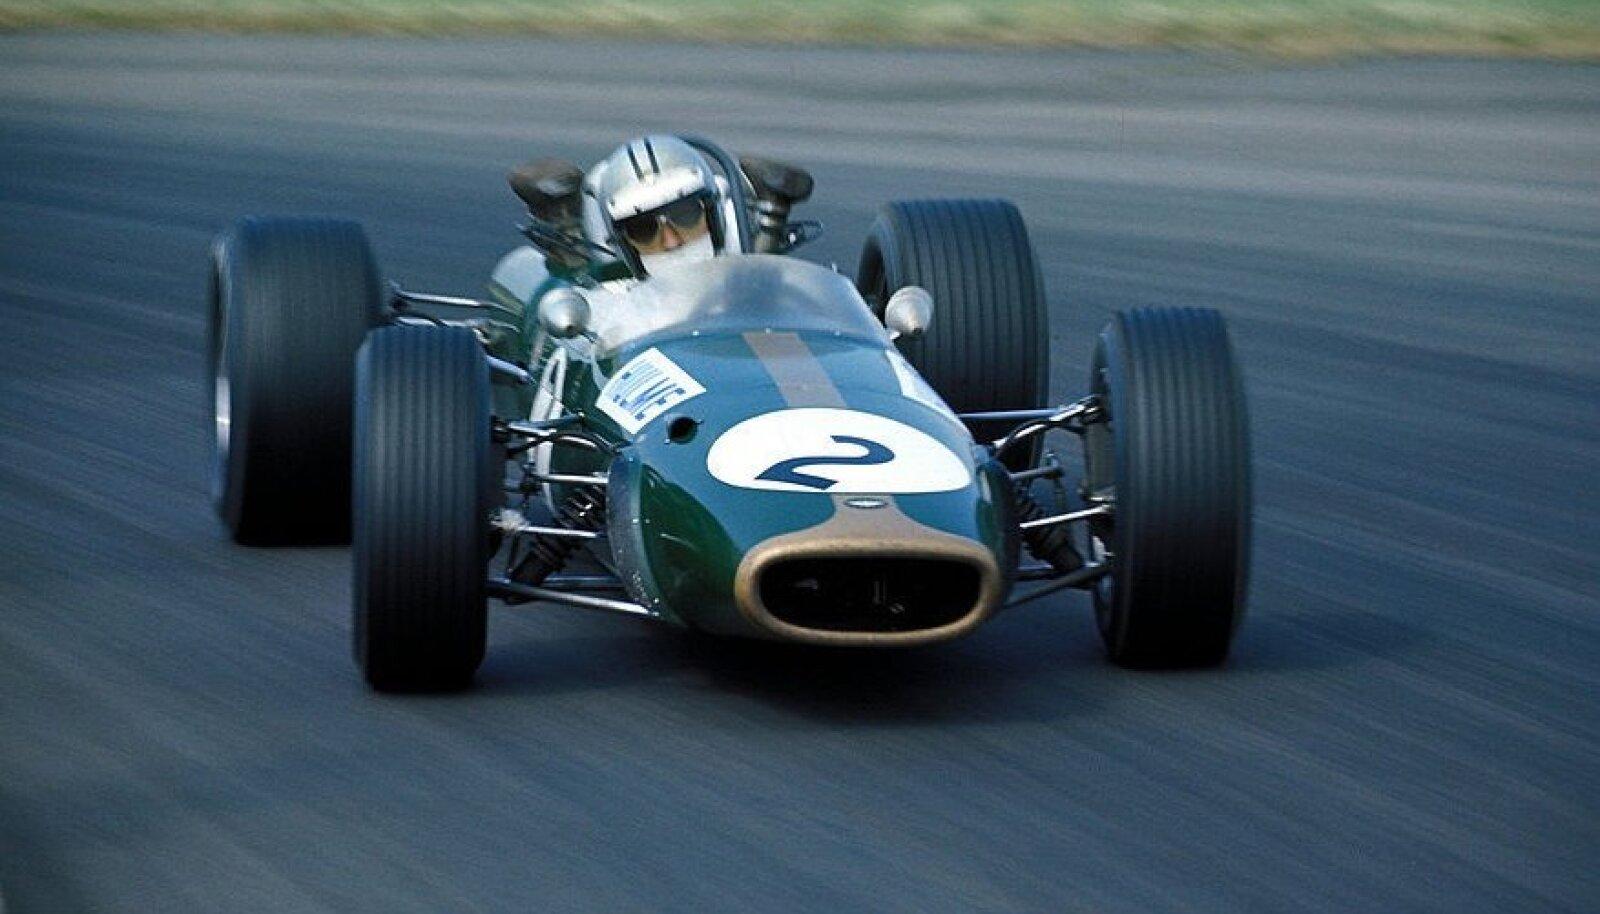 Hulme juhitud Brabham-Repco BT24 Silverstone'i rajal. https://itsawheelthing.tumblr.com/